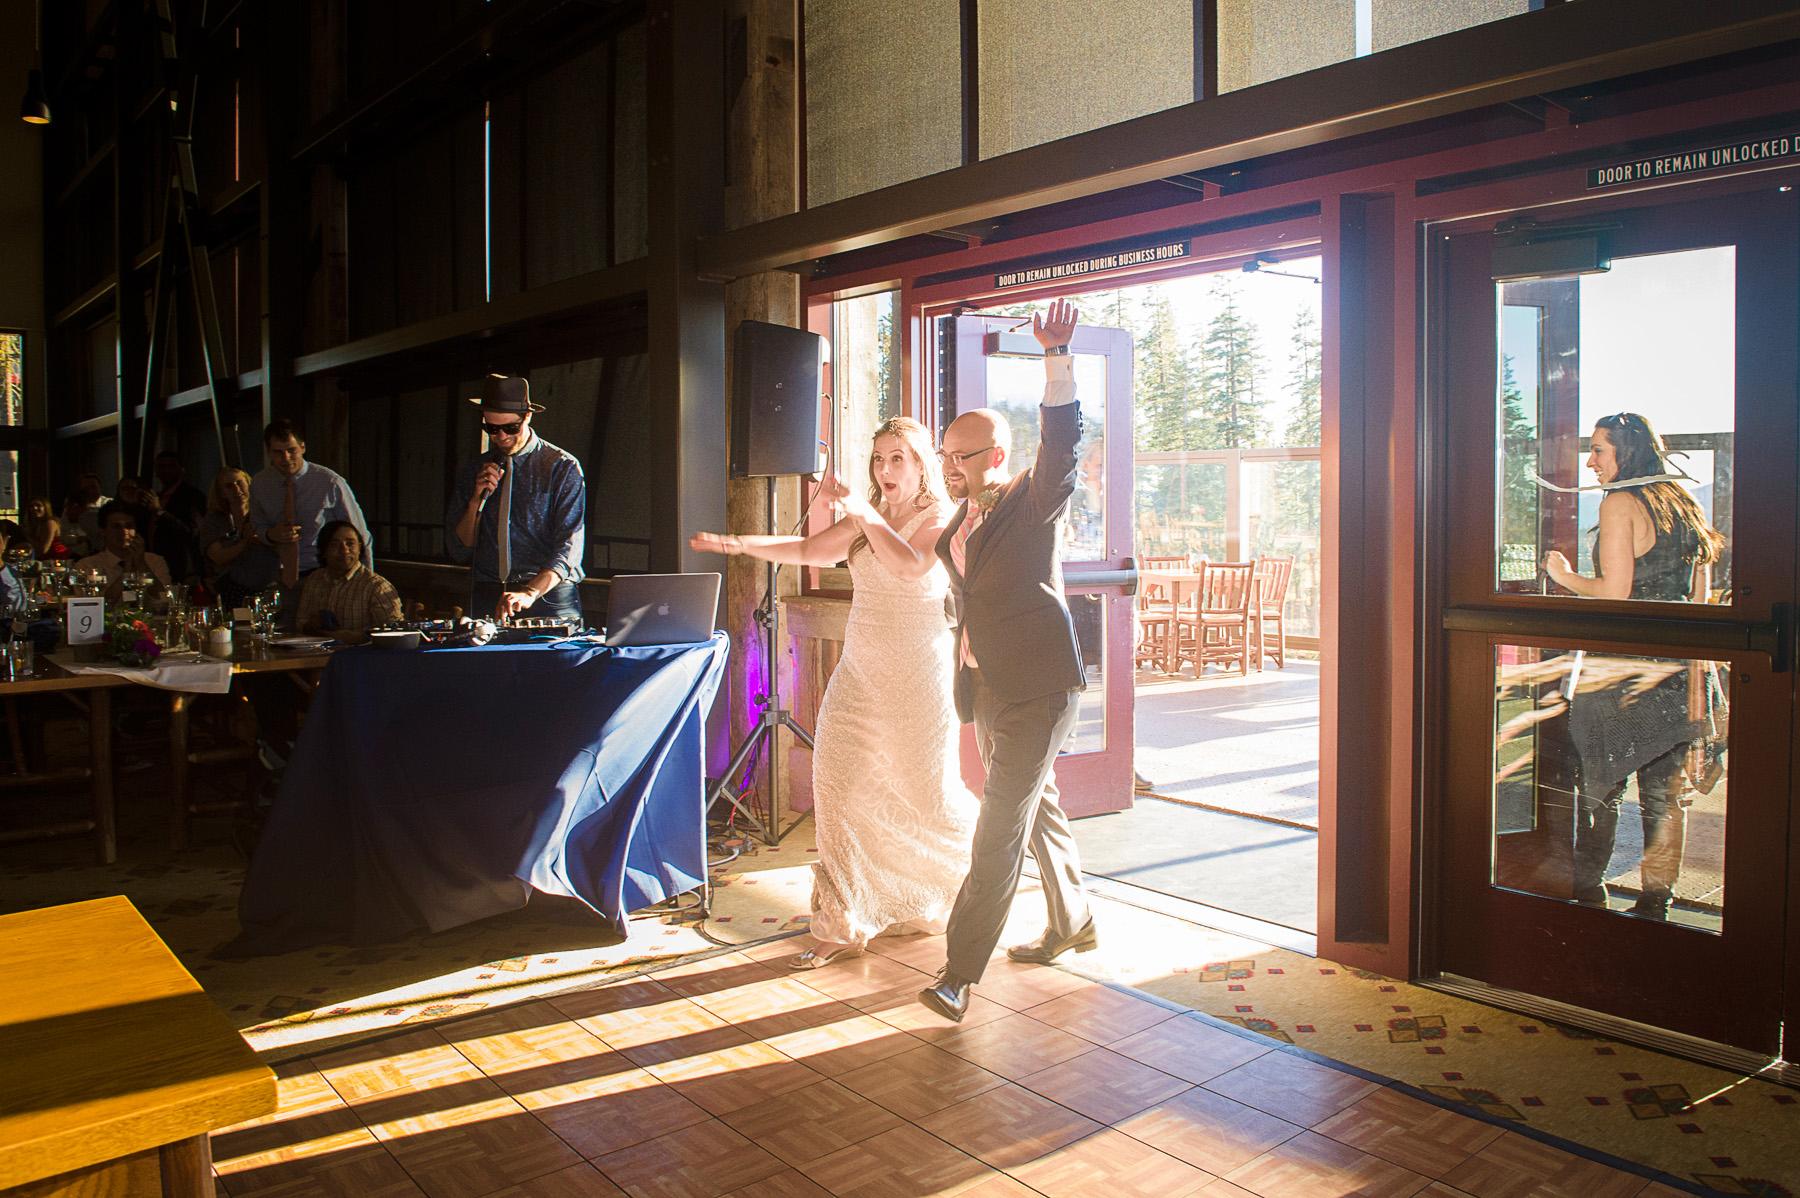 Zephyr_Lodge_Northstar_wedding_photography03.jpg